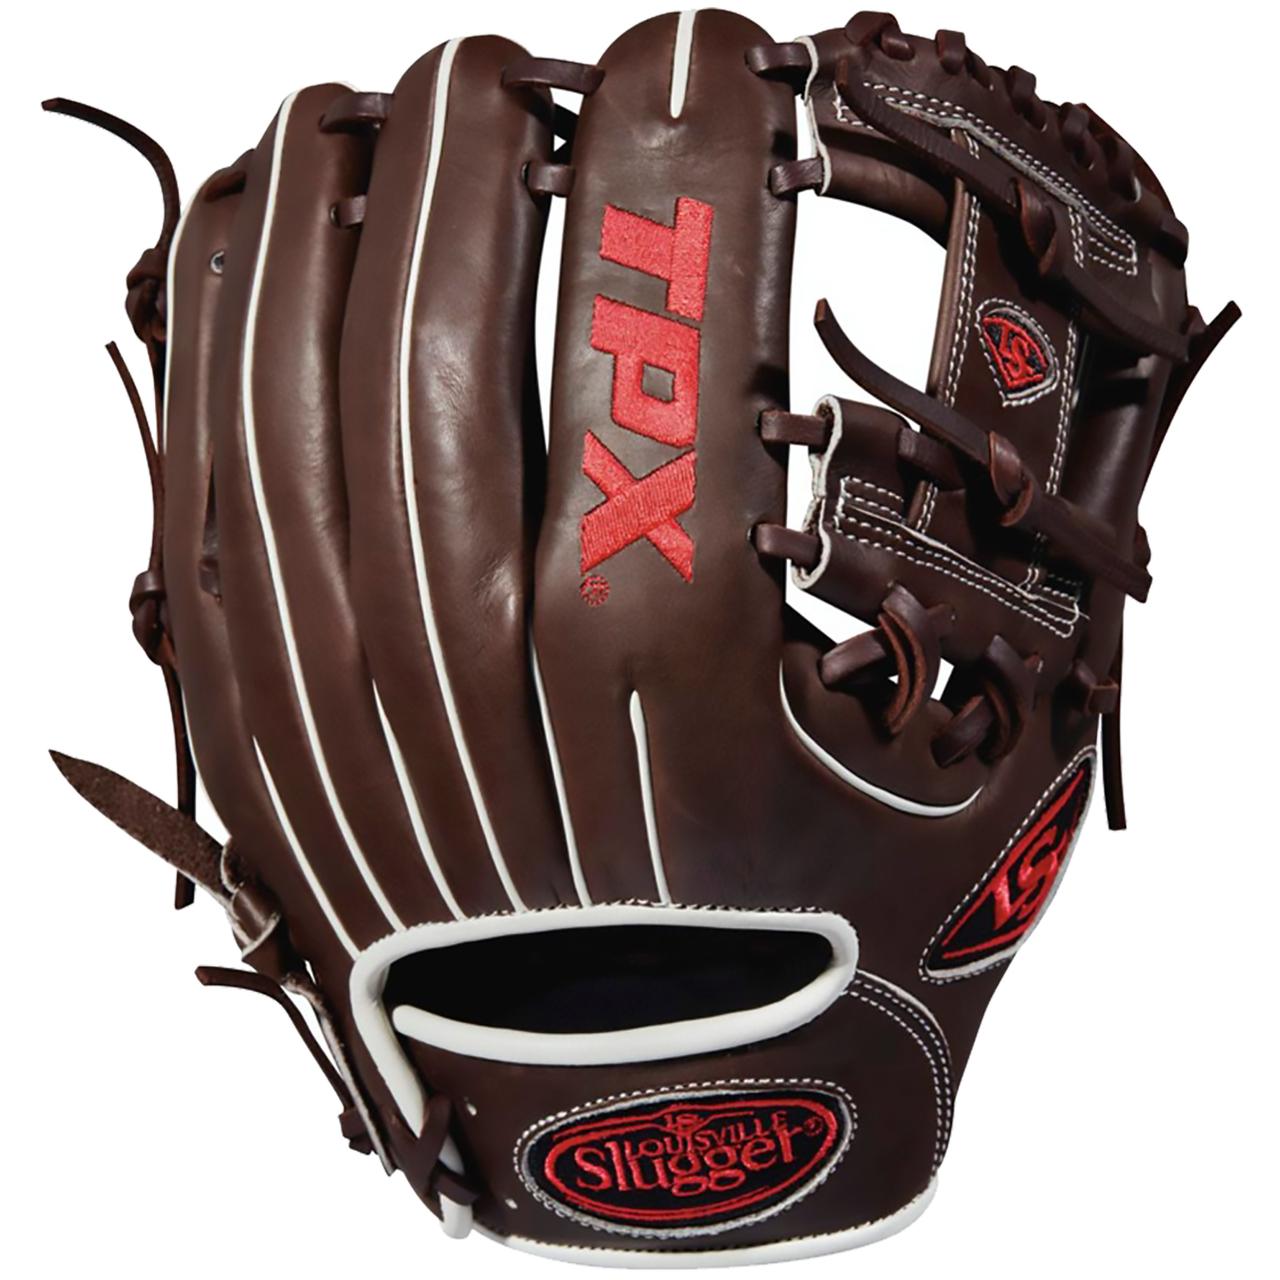 PHINIX 11 Baseball Glove Right Hand Throw